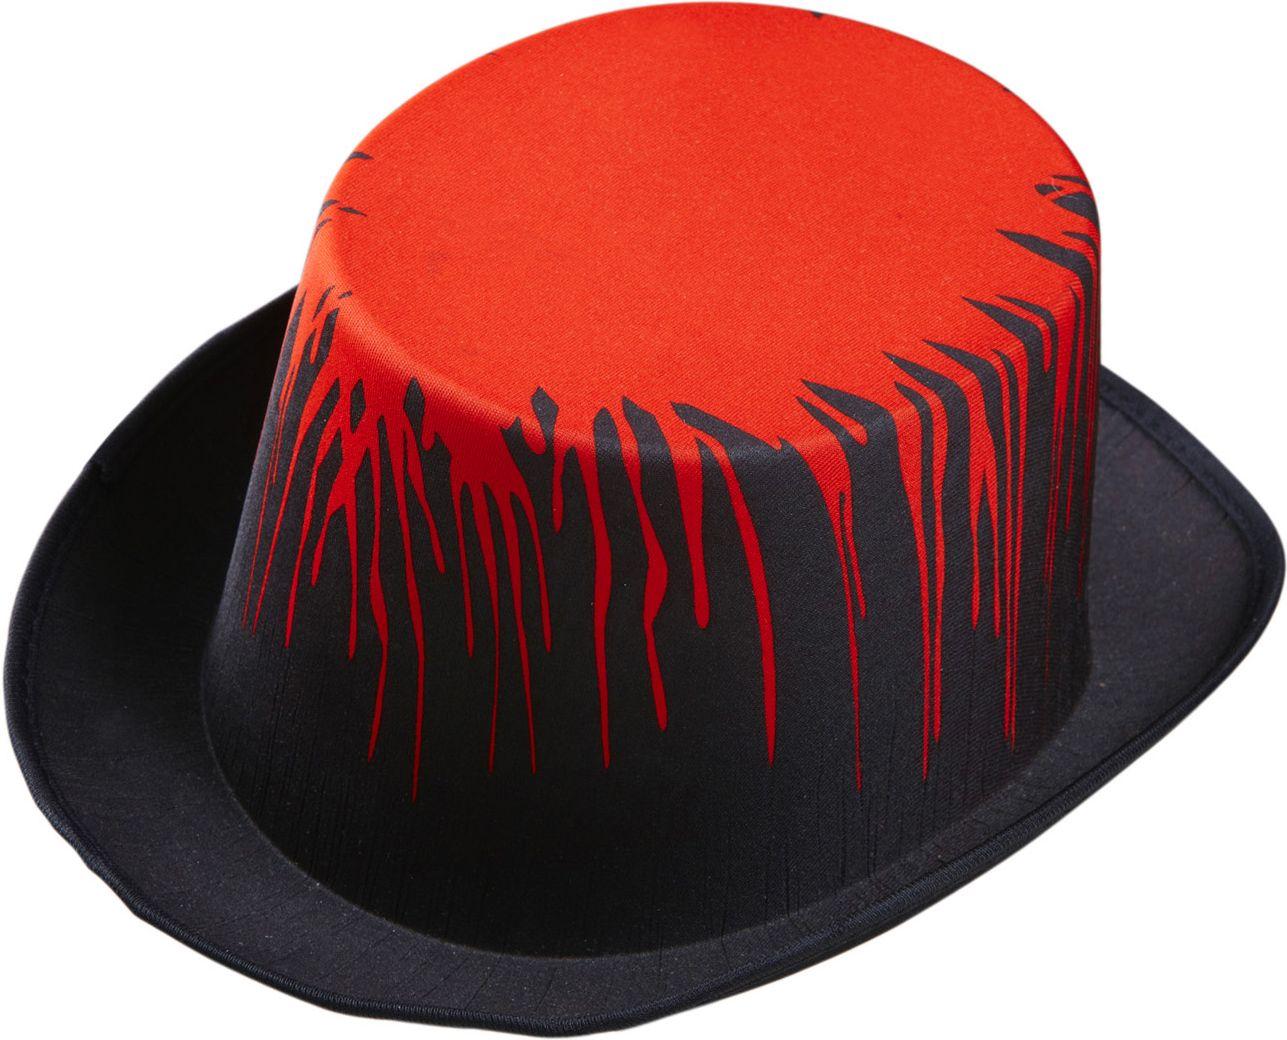 Zwarte hoge hoed met bloed